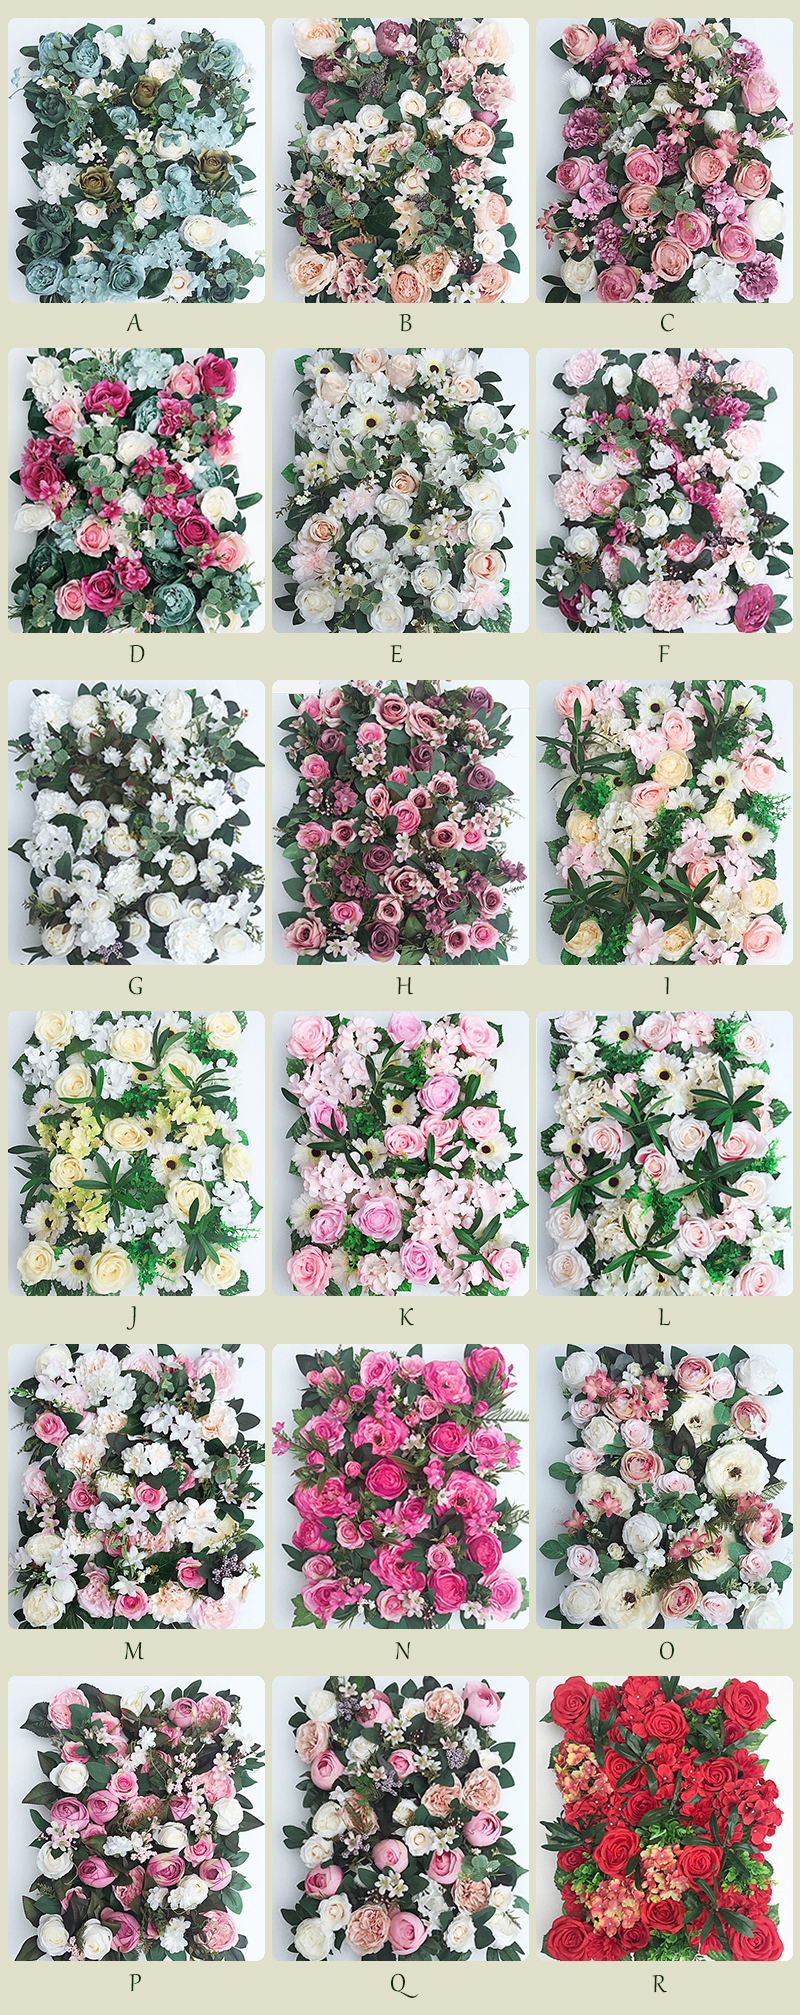 JAROWN Artificial Flower Row Simulation Rose Peony Hydrangea Background Wall Fake Flowers Wedding Feast Arrangement Props Flores (19)